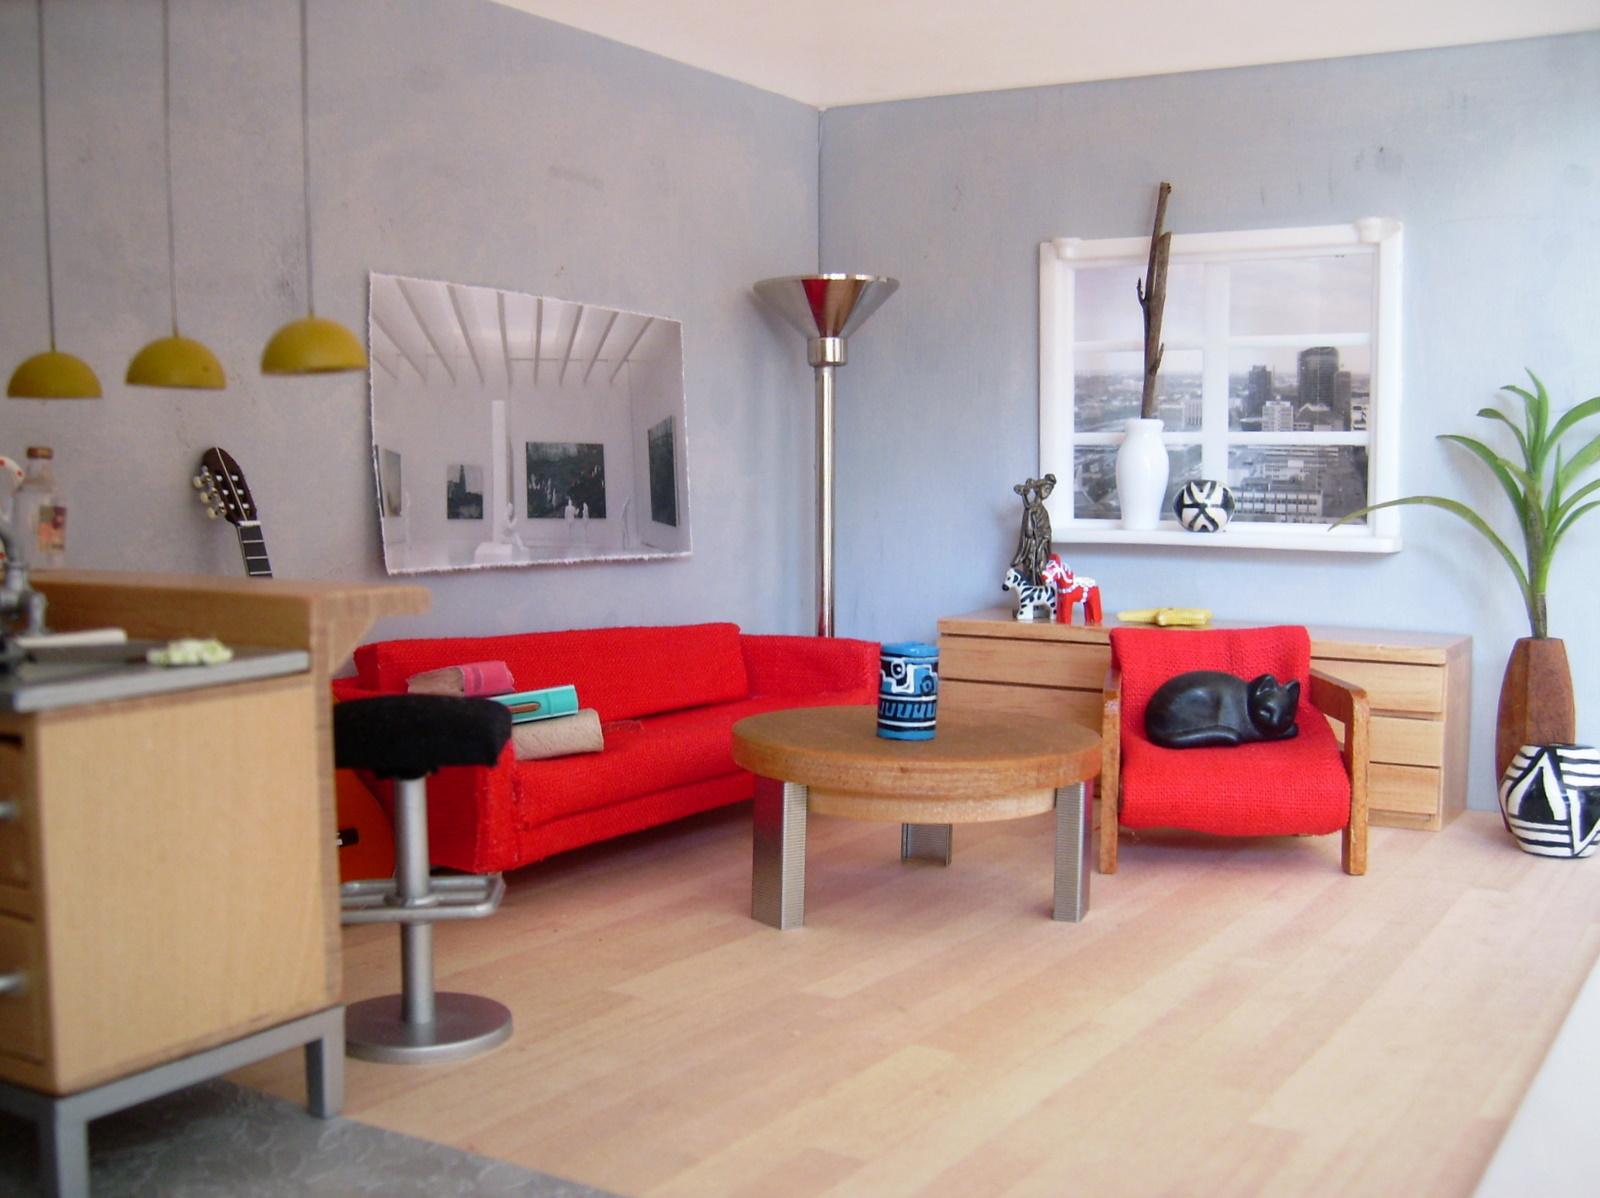 raum f r raum das rote sofa the red sofa. Black Bedroom Furniture Sets. Home Design Ideas